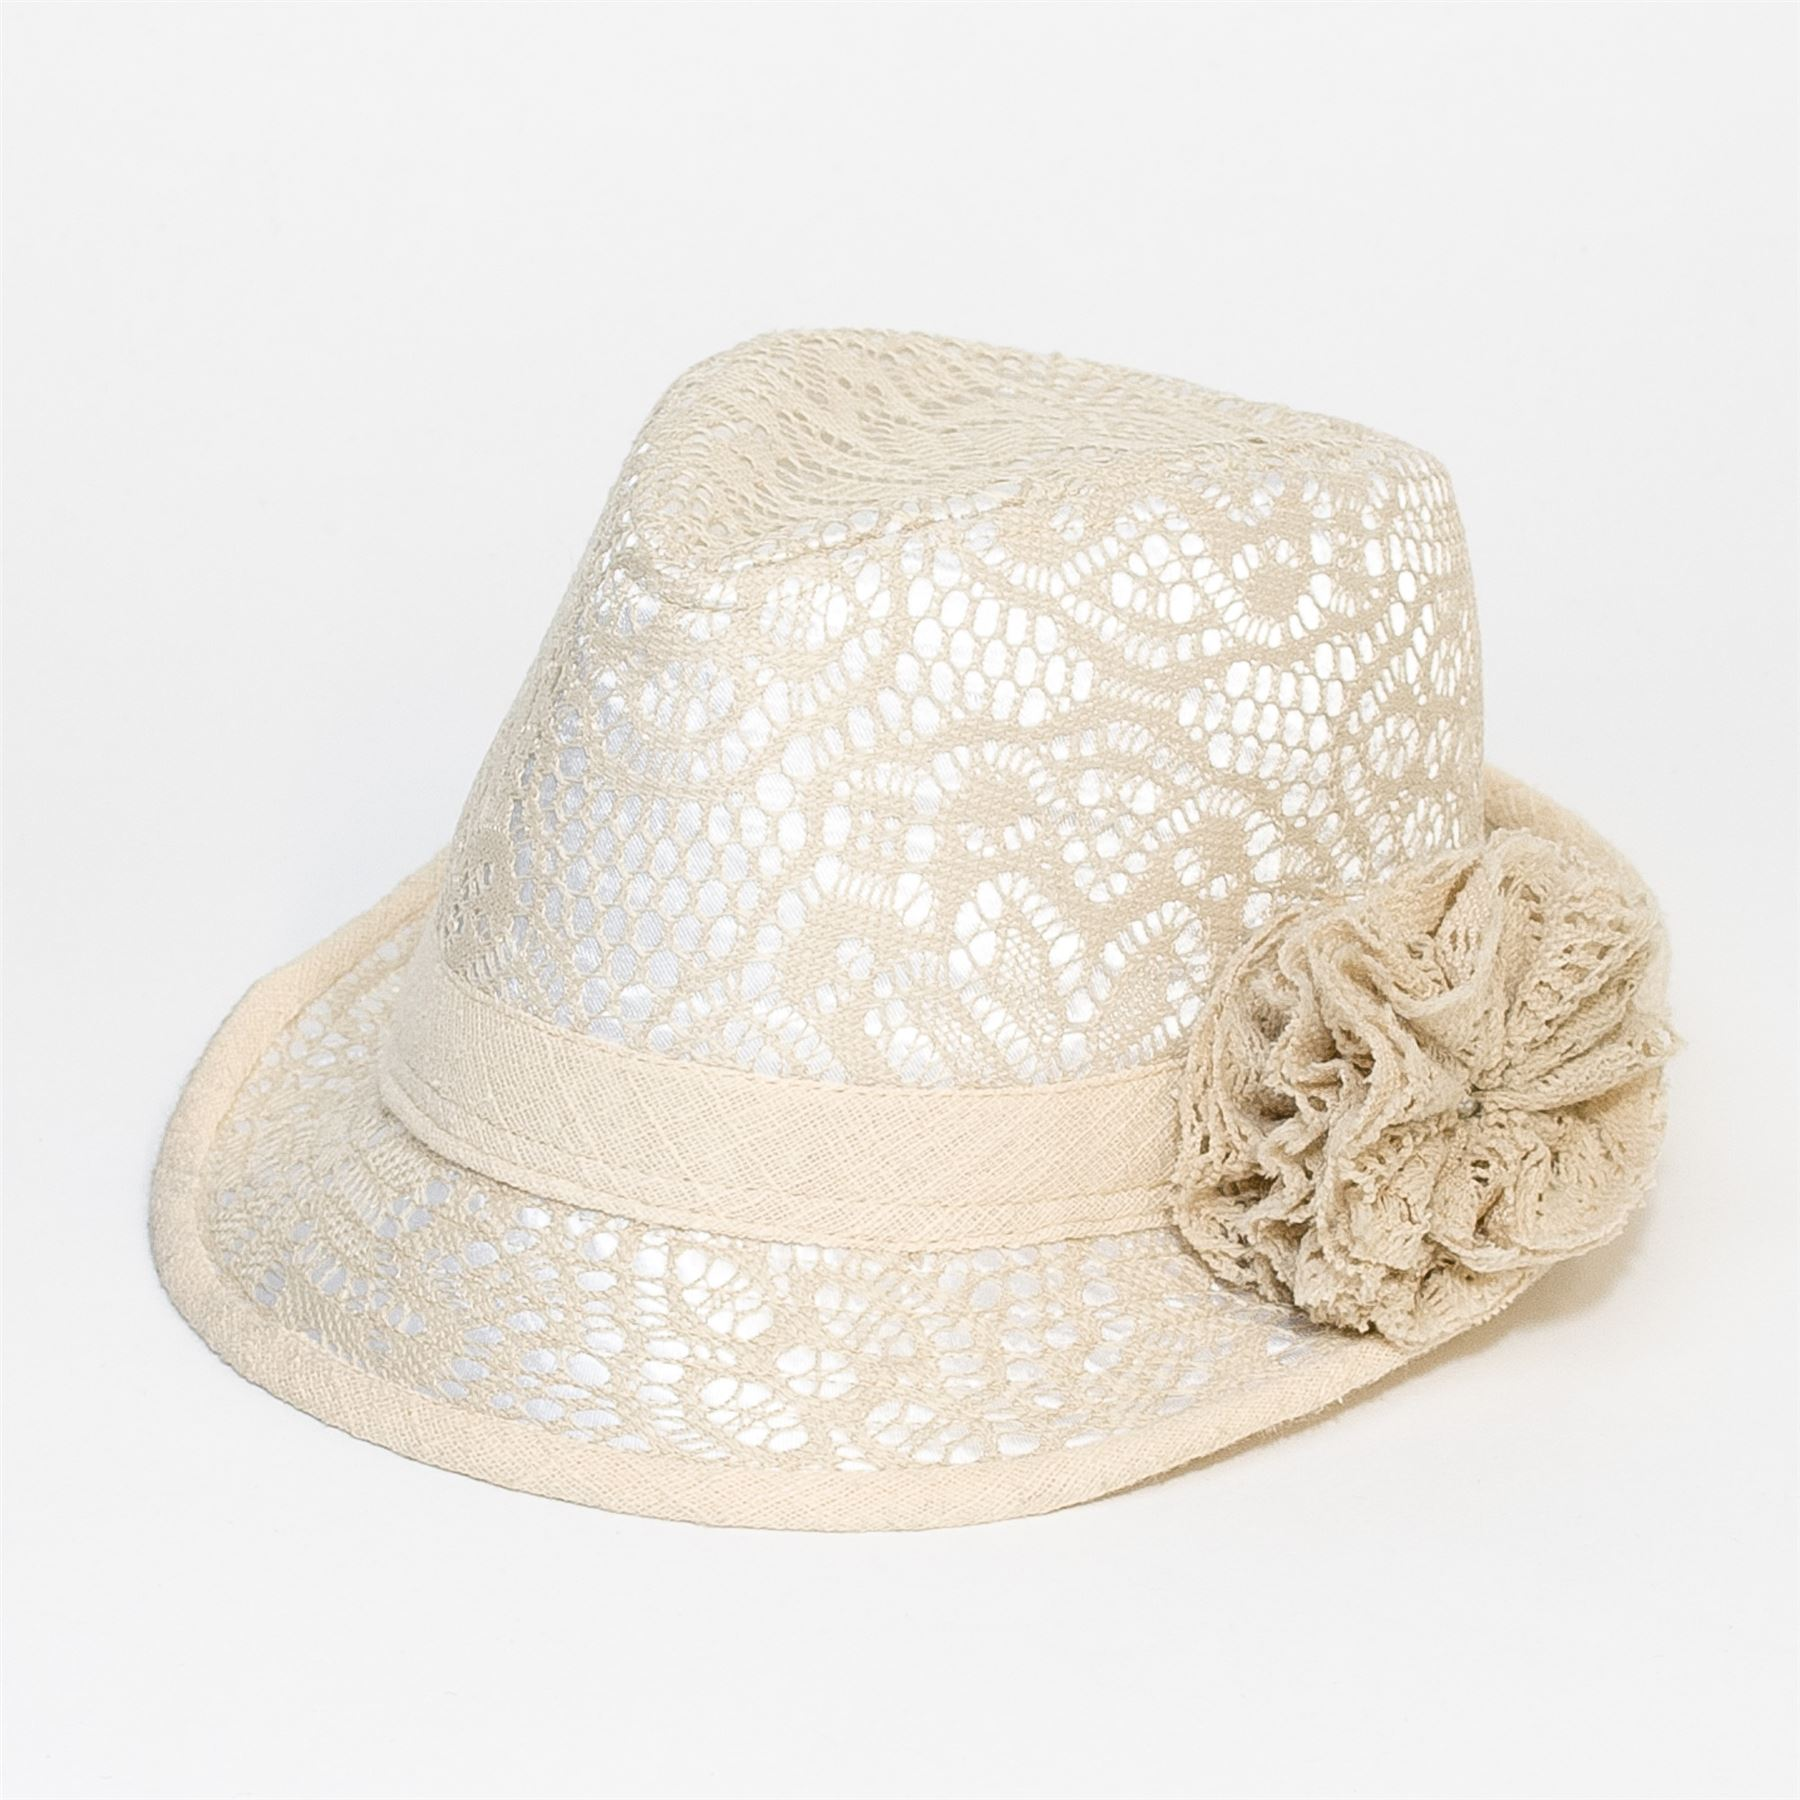 Floral Crochet Mens Women Felt Fedora Trilby Unisex Hat Cap Floral Crochet Band